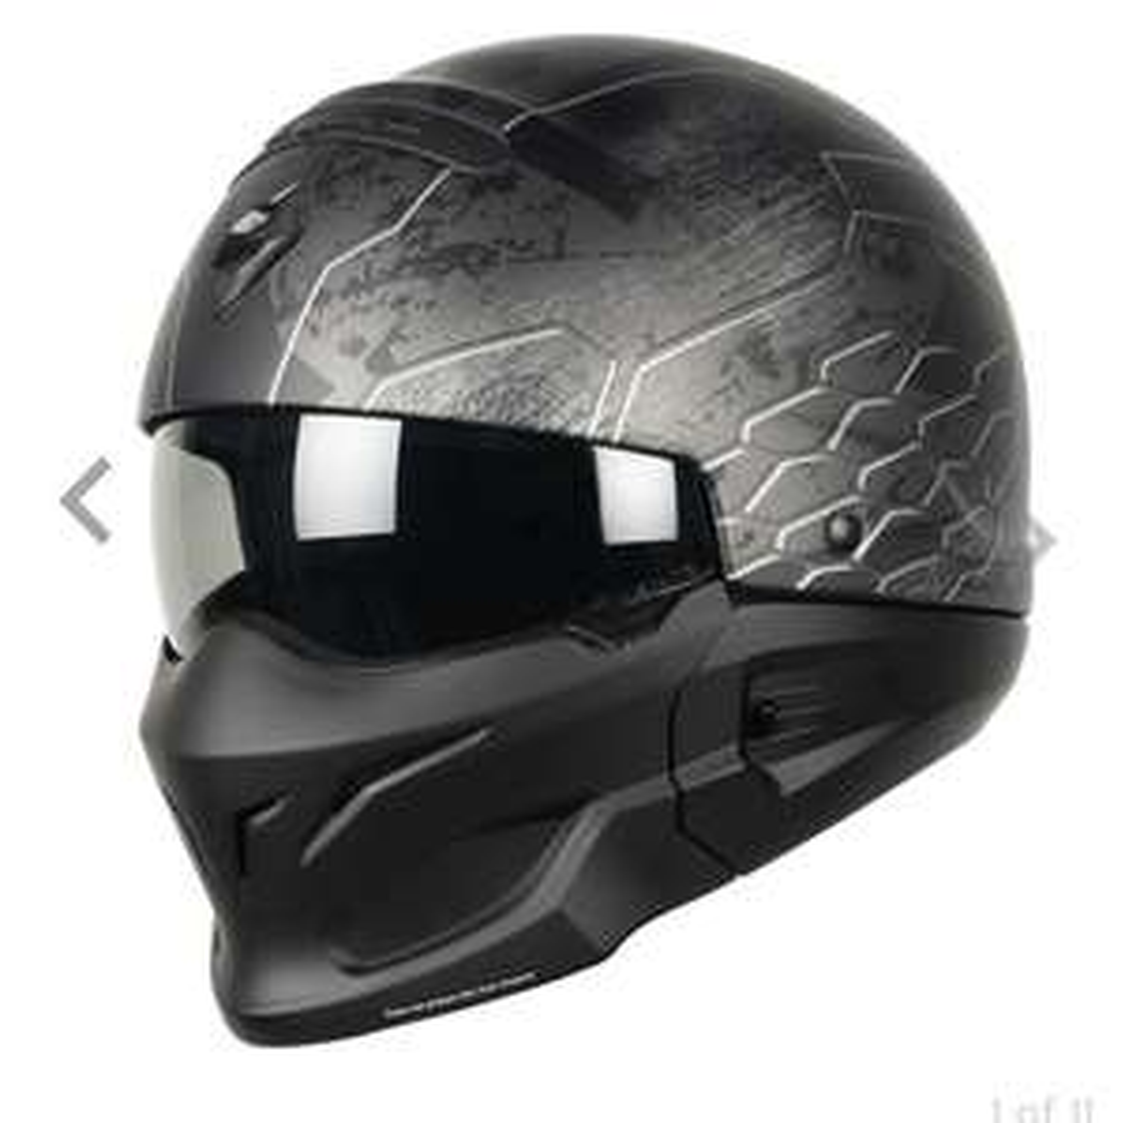 Casque Moto Scorpion EXO-Ccmbat Ratnik - Tailles au choix